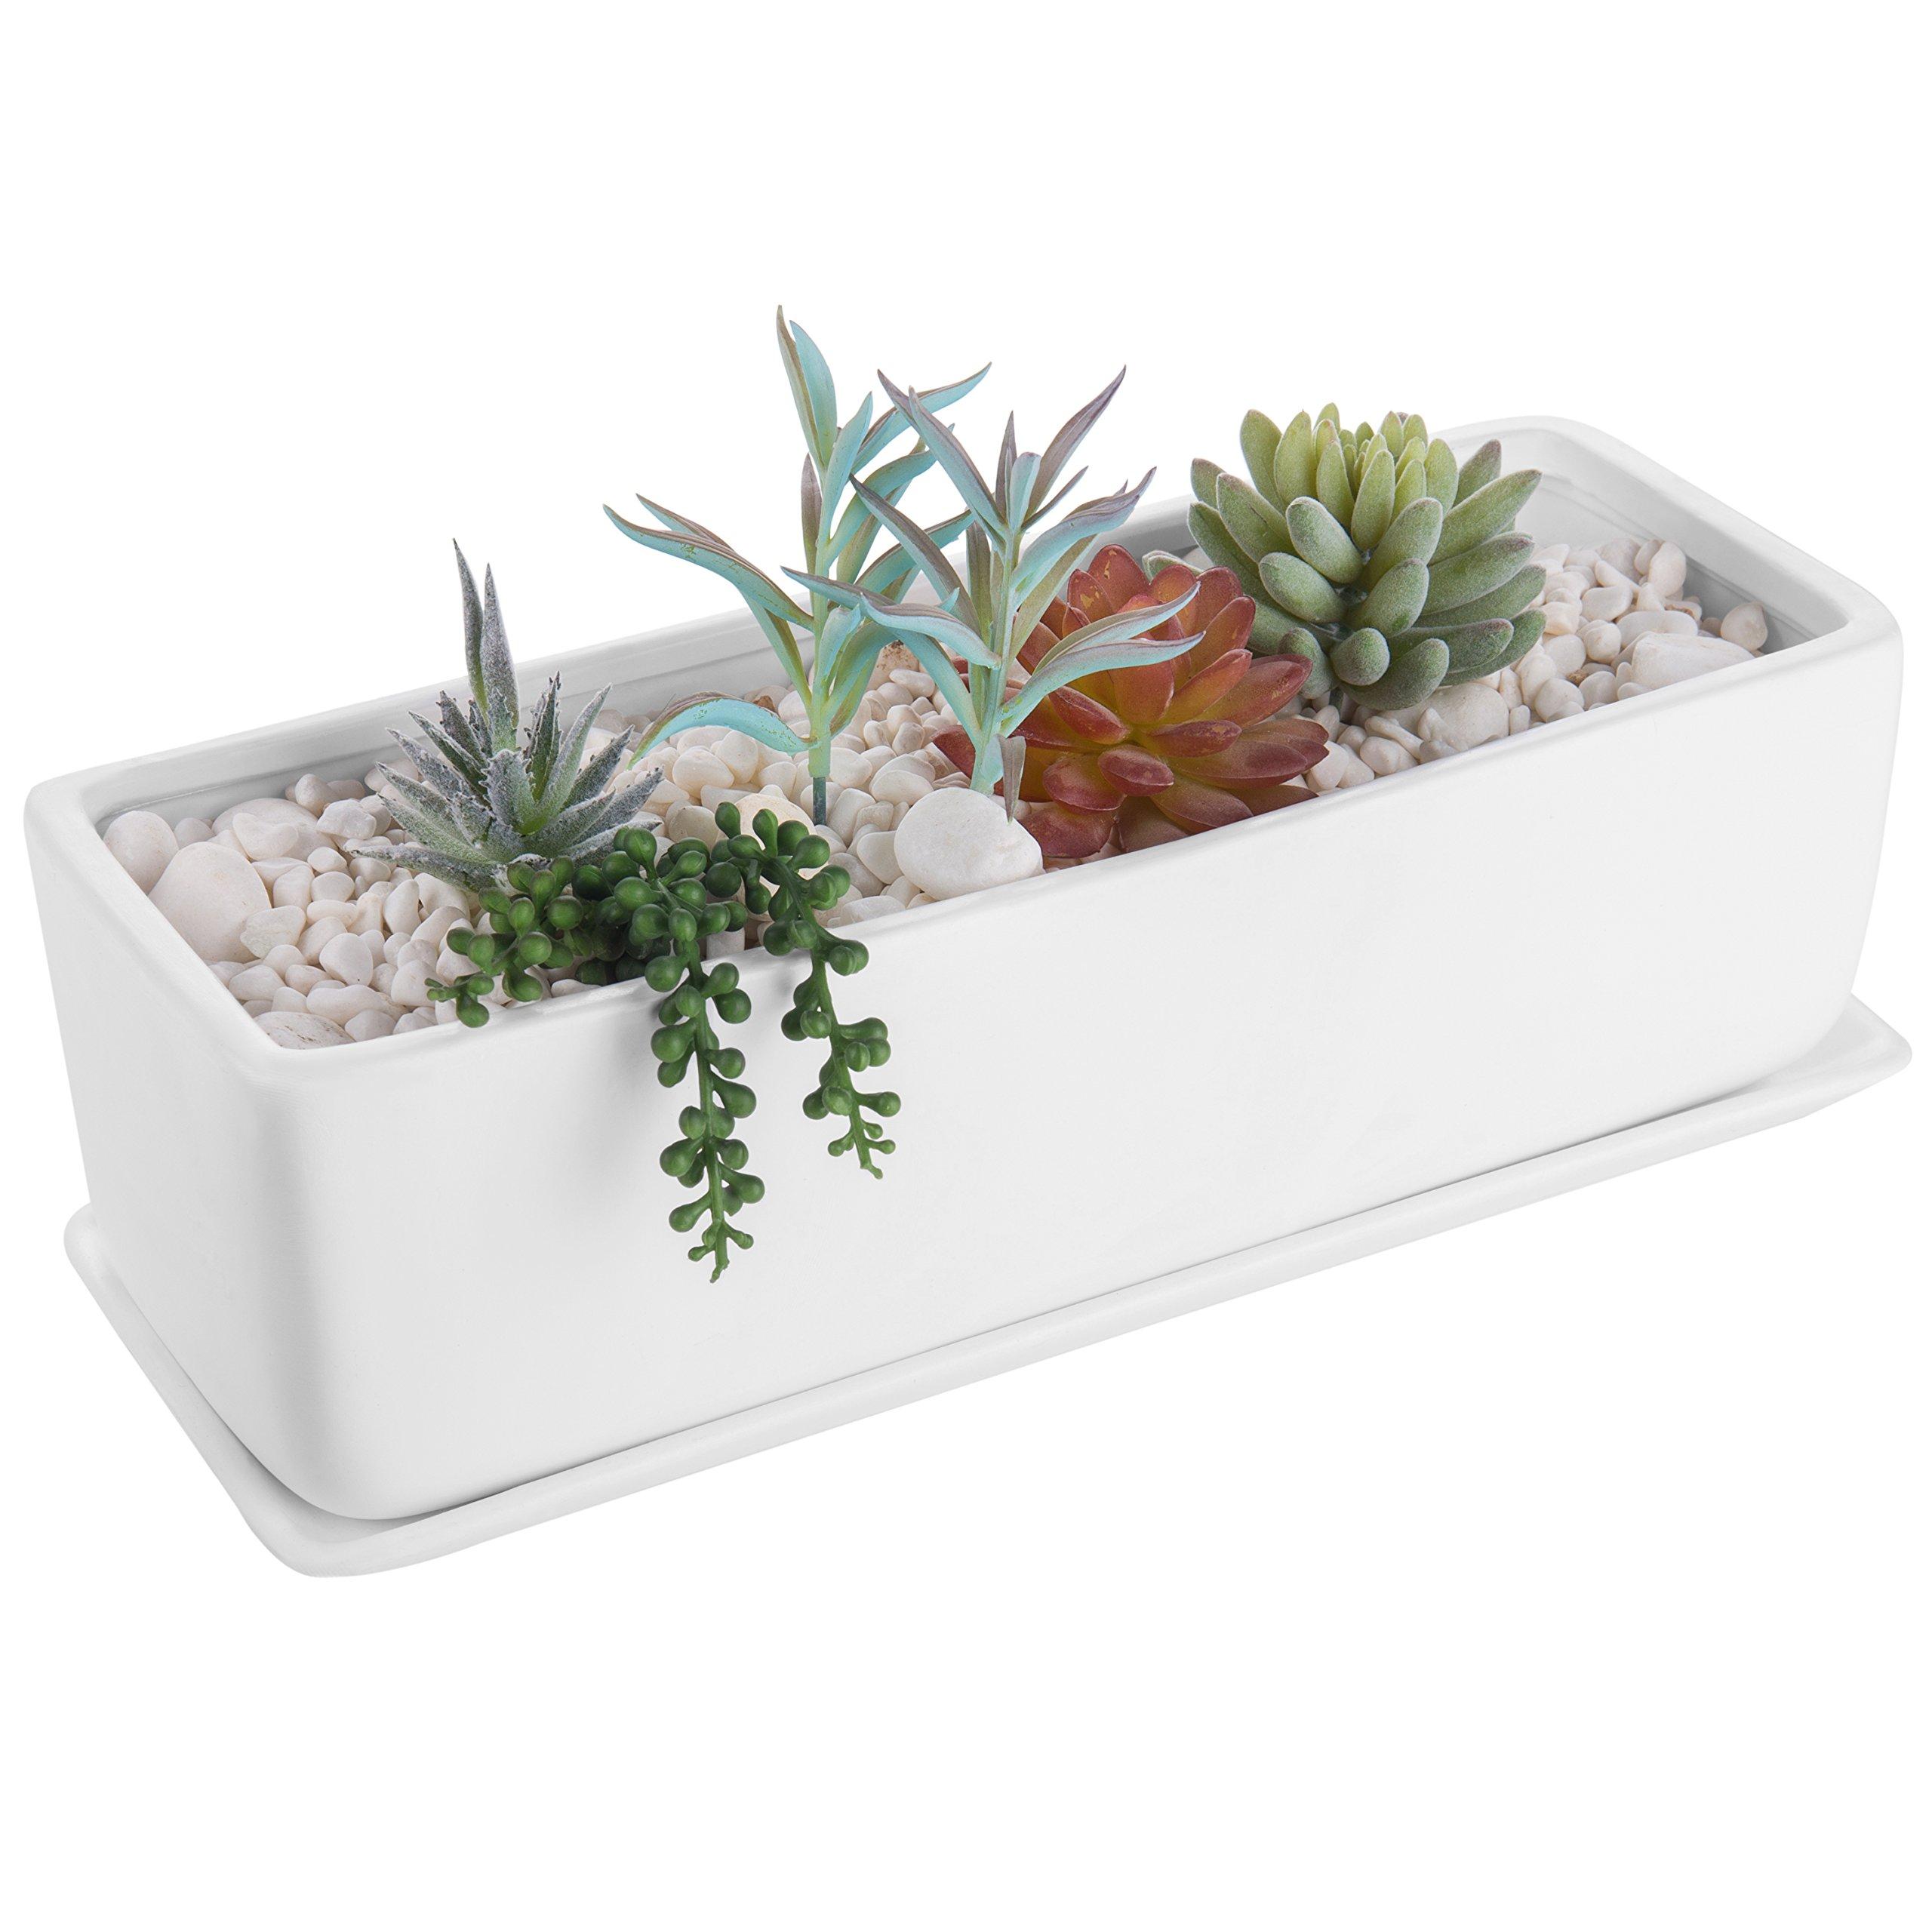 MyGift 14-Inch Rectangular Modern Ceramic Succulent Planter Pot, Window Box with Saucer, Matte White